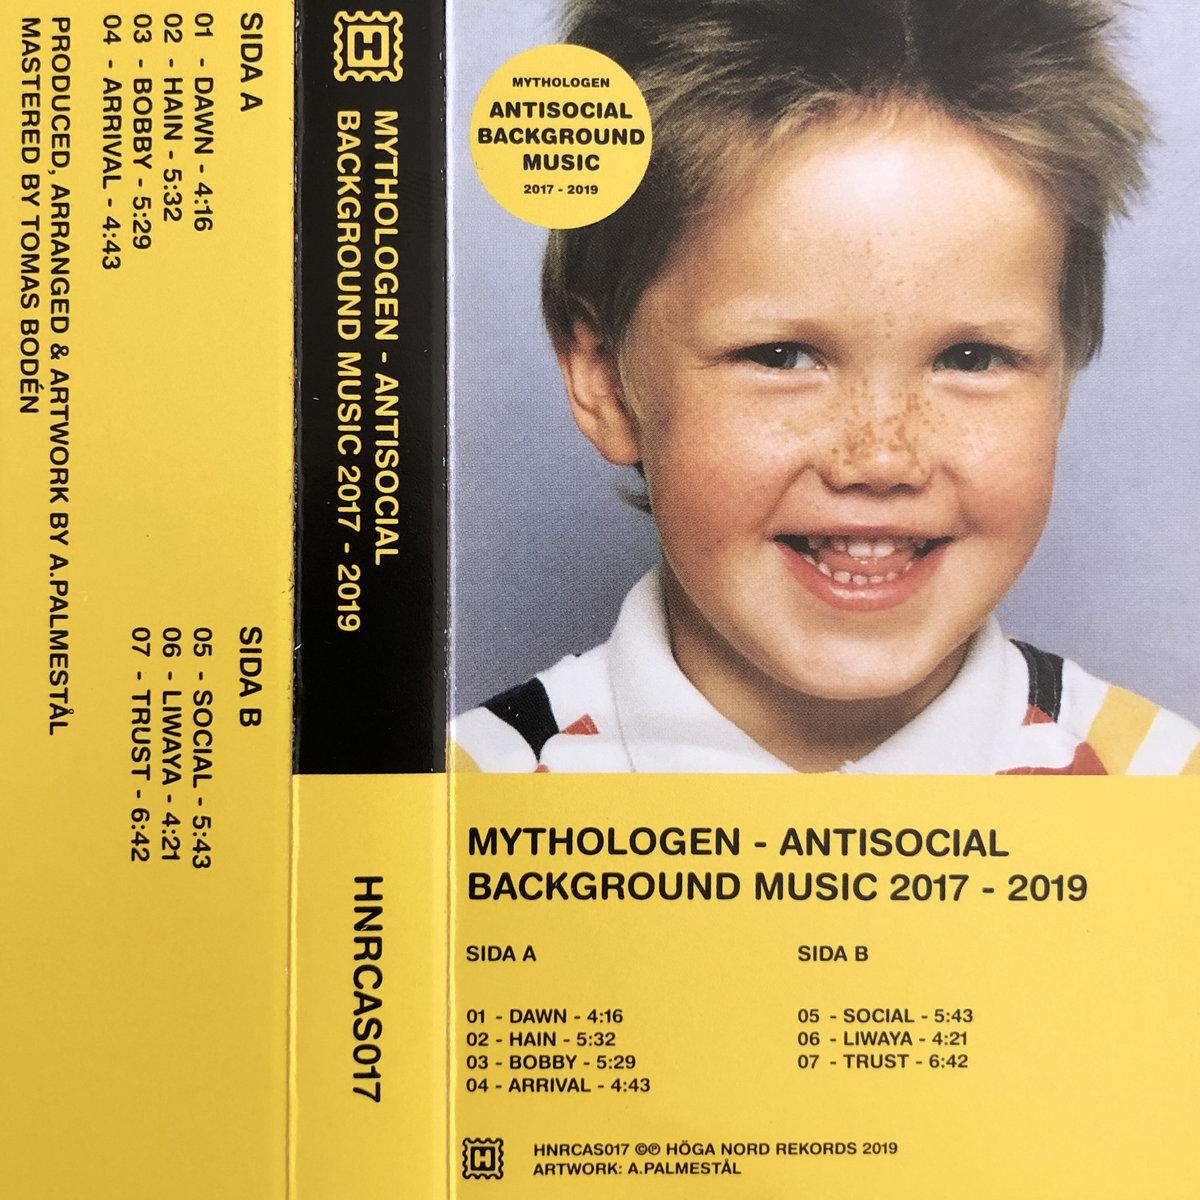 HNRLP017: Antisocial Background Music 2017 - 2019   Höga